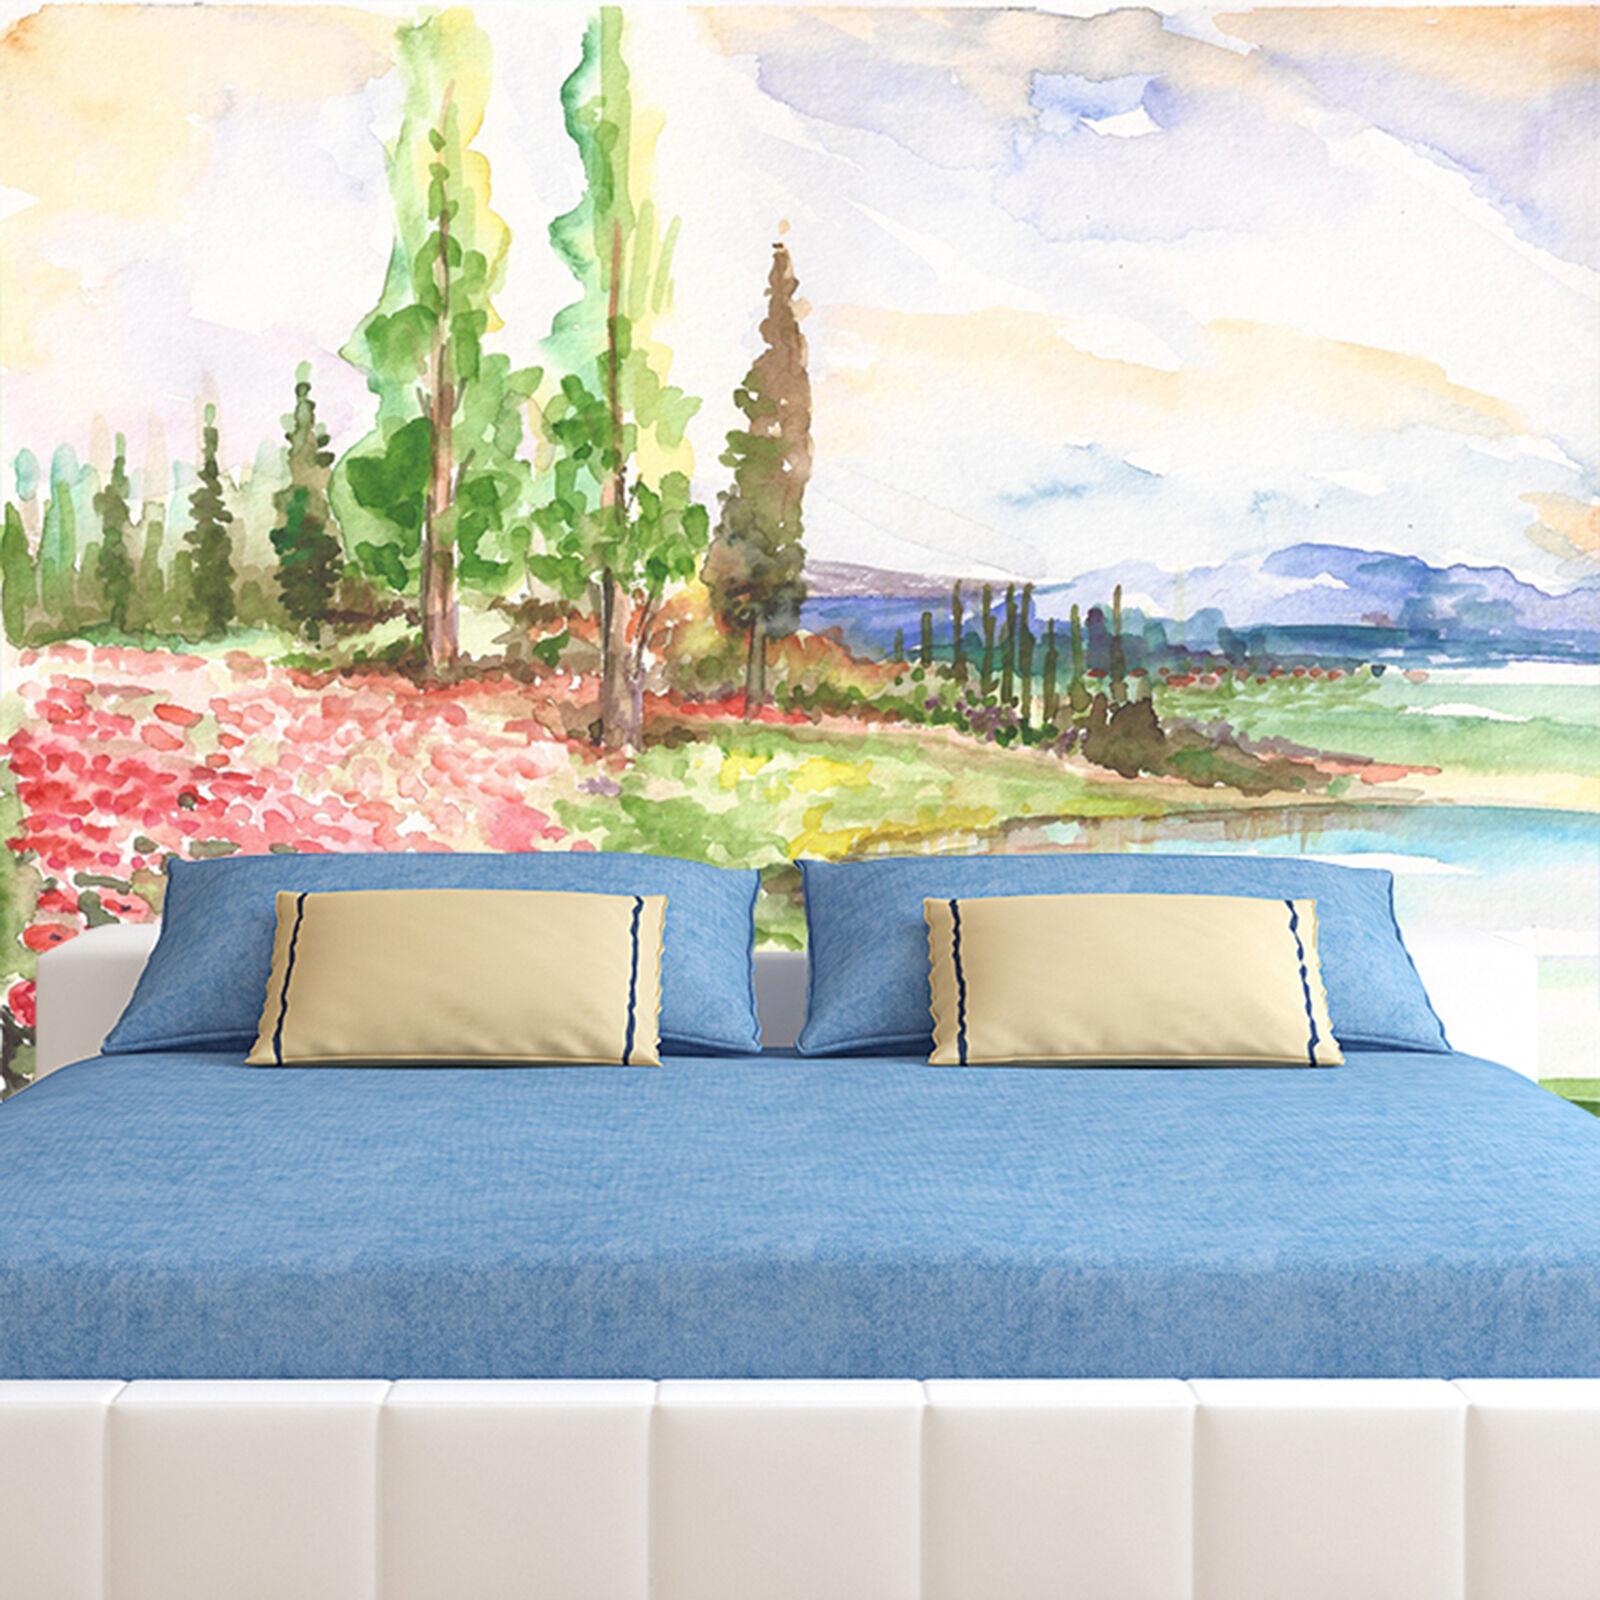 3D Gemälde 7895 Fototapeten Wandbild Fototapete Bild Tapete Familie Kinder DE